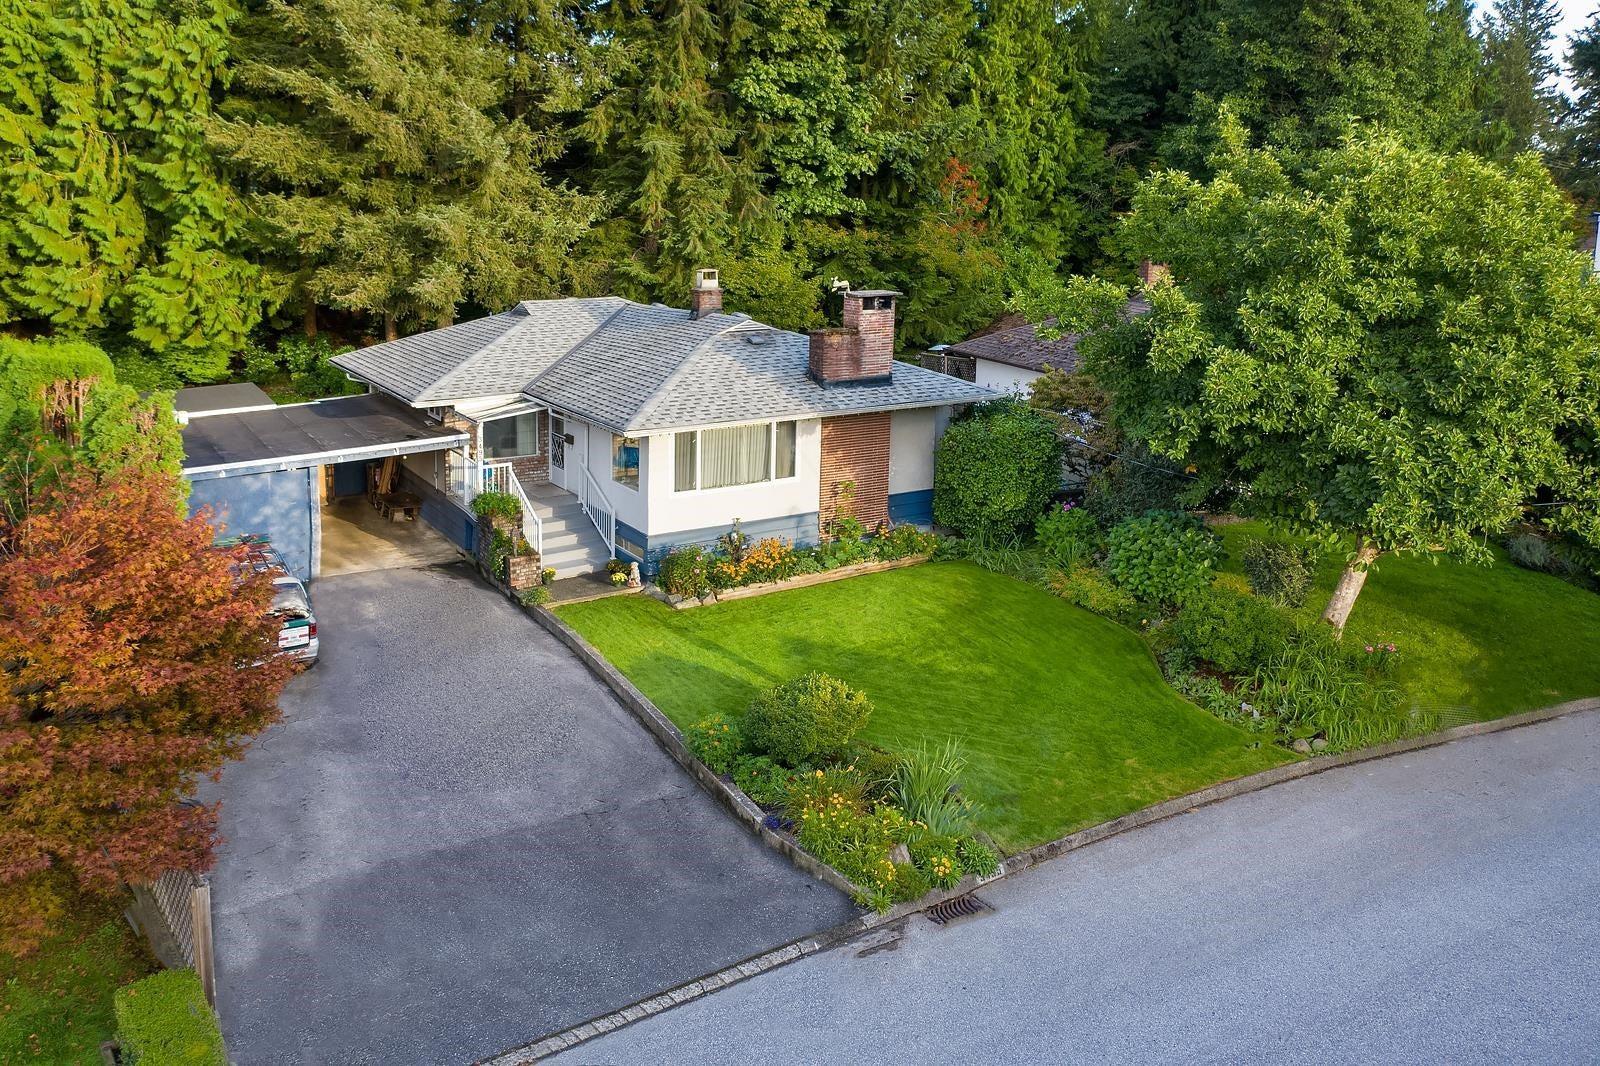 3495 WELLINGTON CRESCENT - Edgemont House/Single Family for sale, 3 Bedrooms (R2617949) - #1